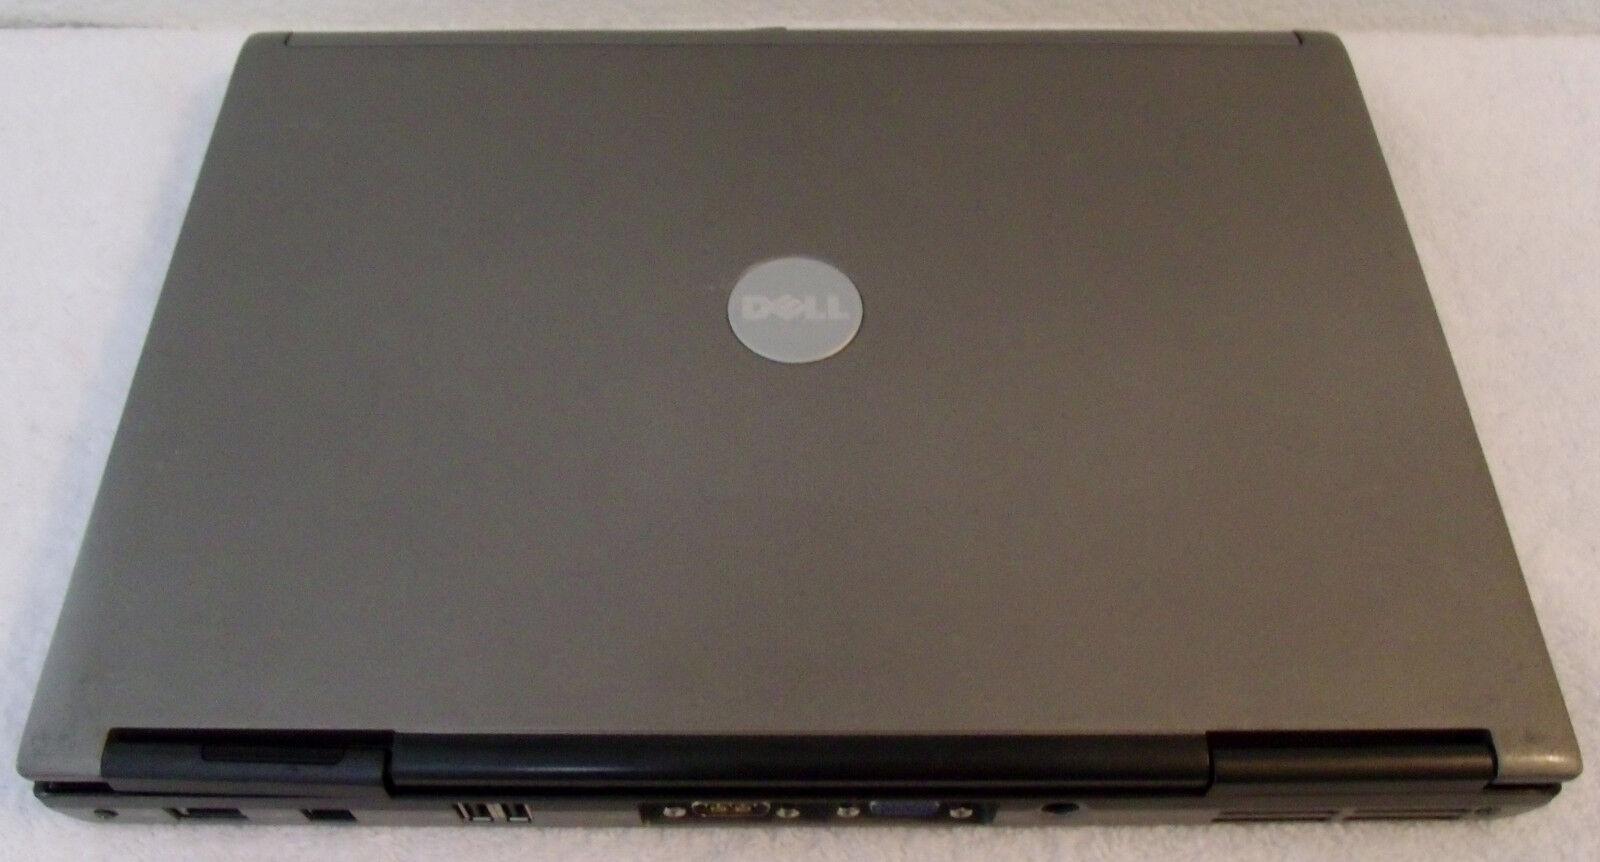 DELL Latitude D610 dual Pent m@1.73GHz 40GBHD 1.25GBRAM Win 7 Home bat a/c XLCON